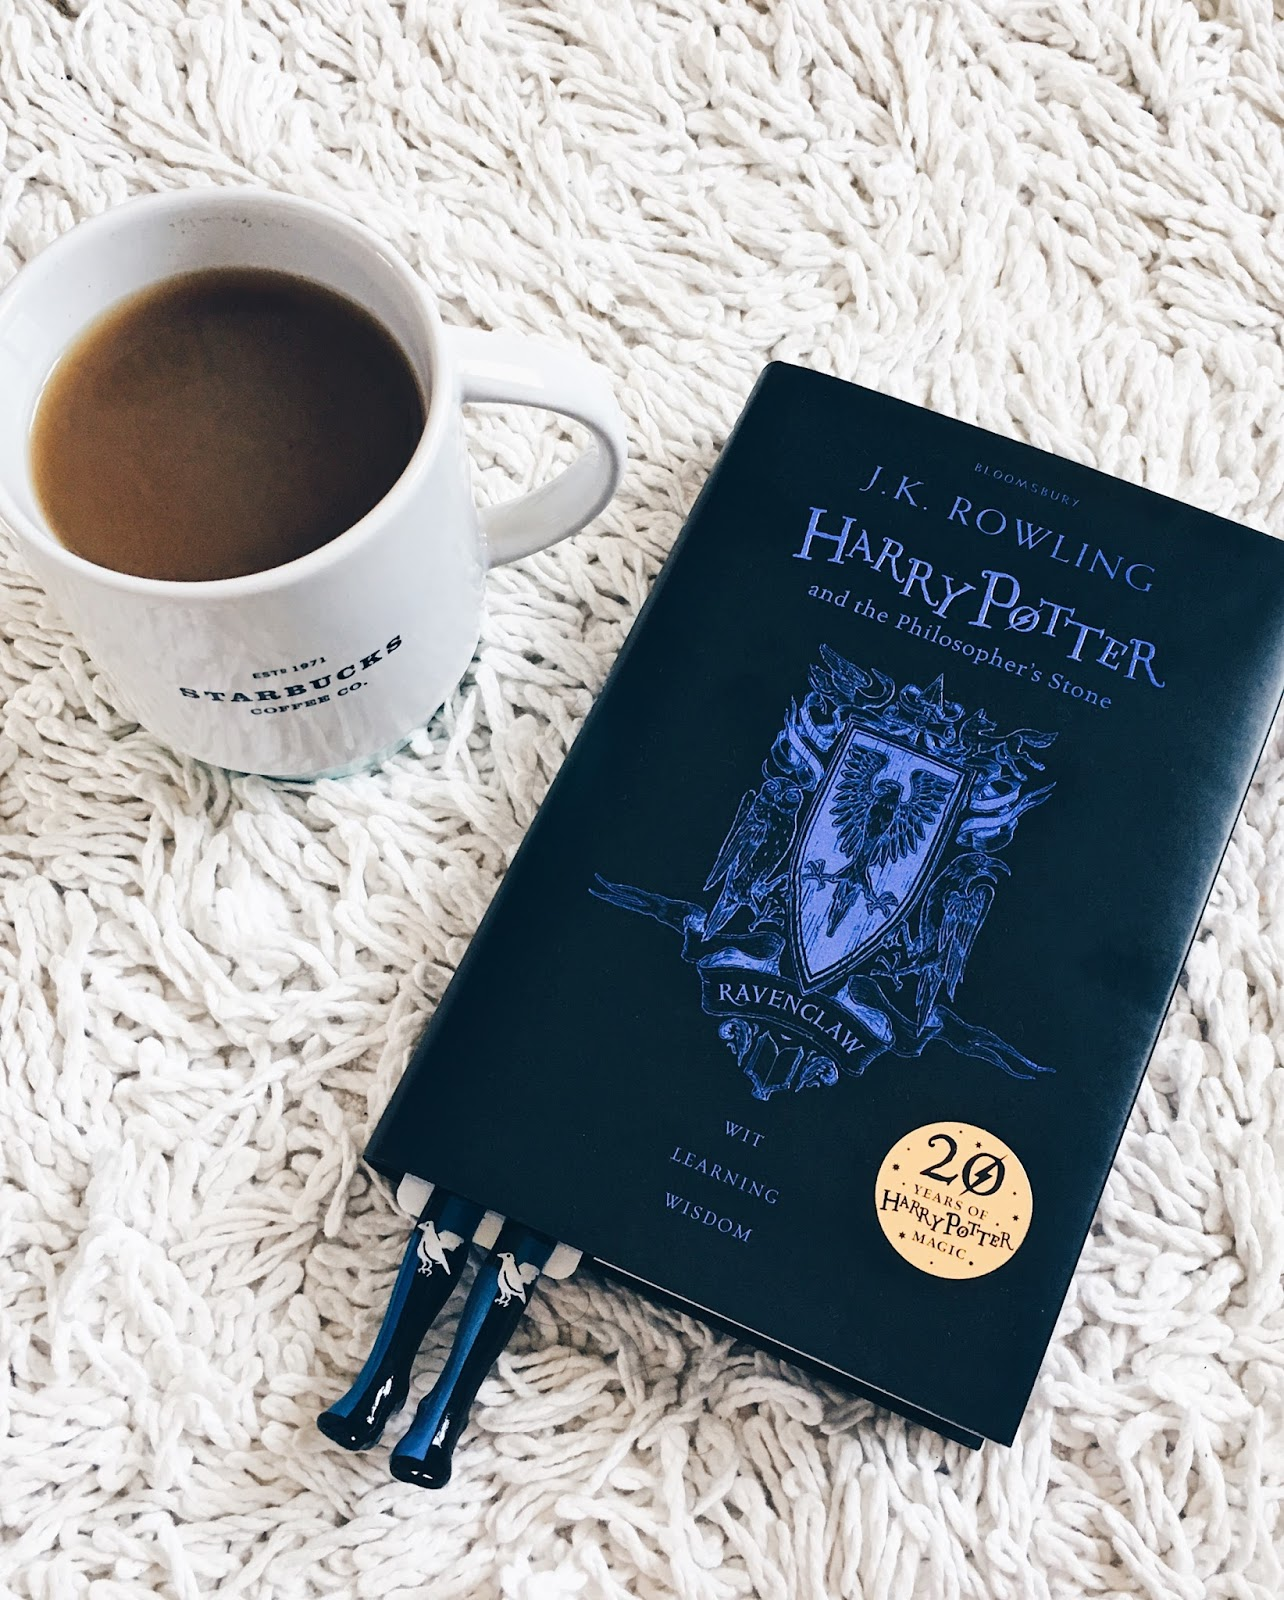 Harry Potter É A Pedra Filosofal within bobby pins: livros    harry potter e a pedra filosofal - edição